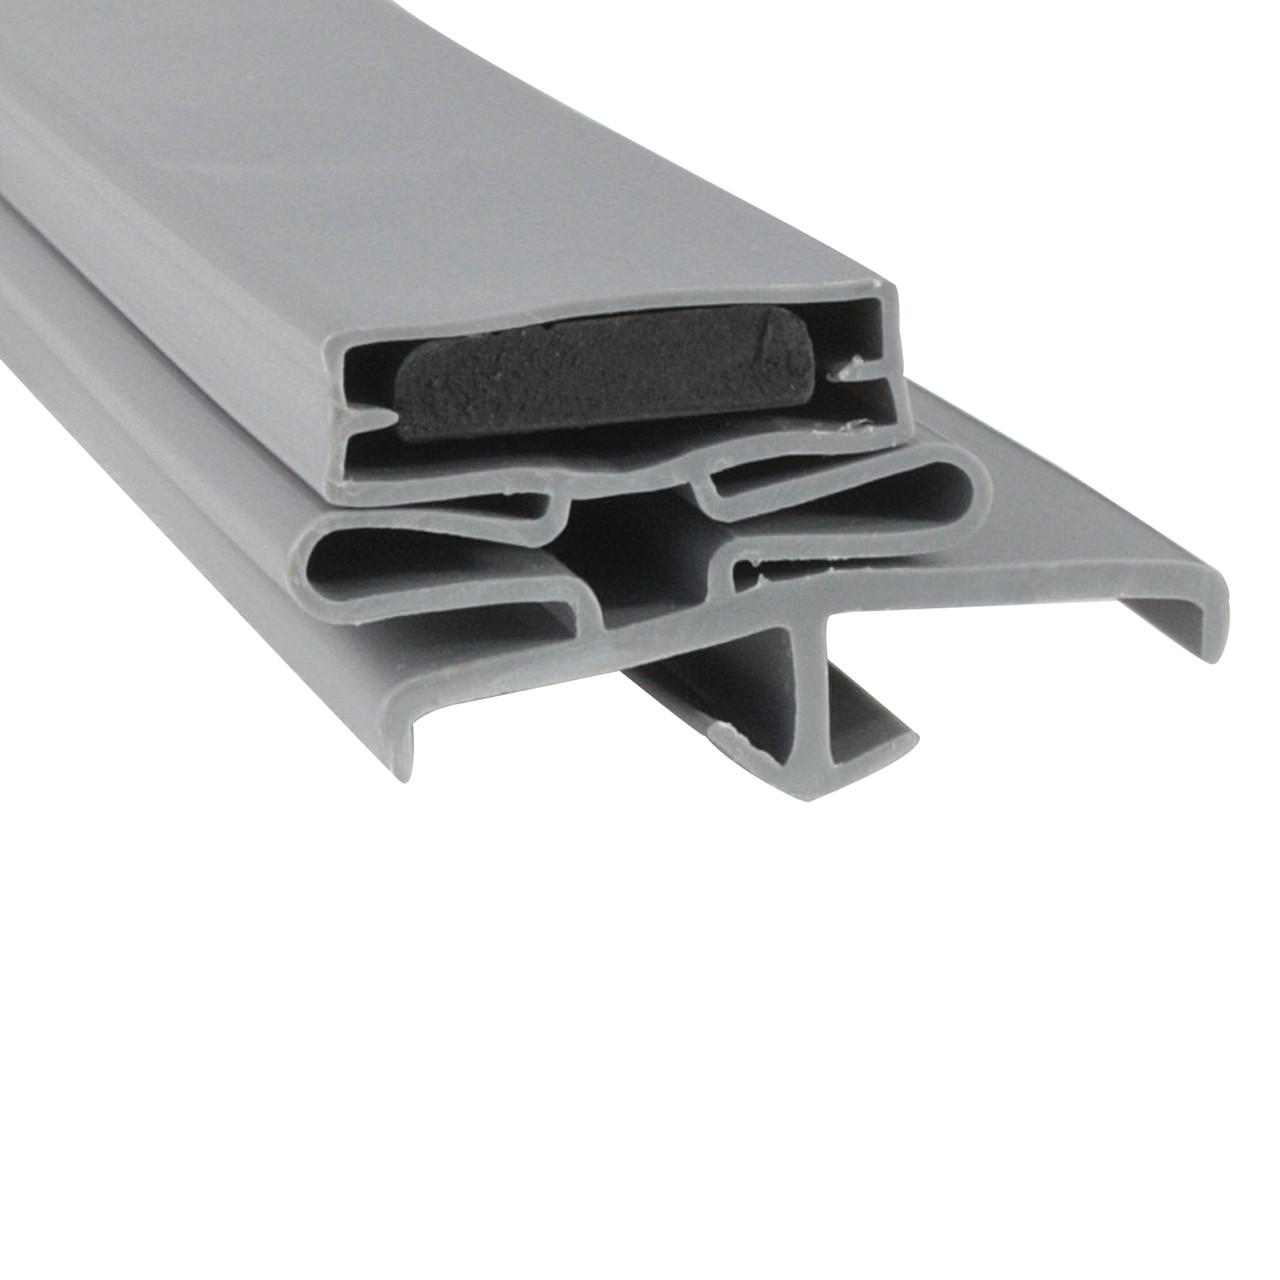 Delfield Door Gasket Profile 168 22 7/8 x 28 1/4 -A2.0880, 170-2302-C